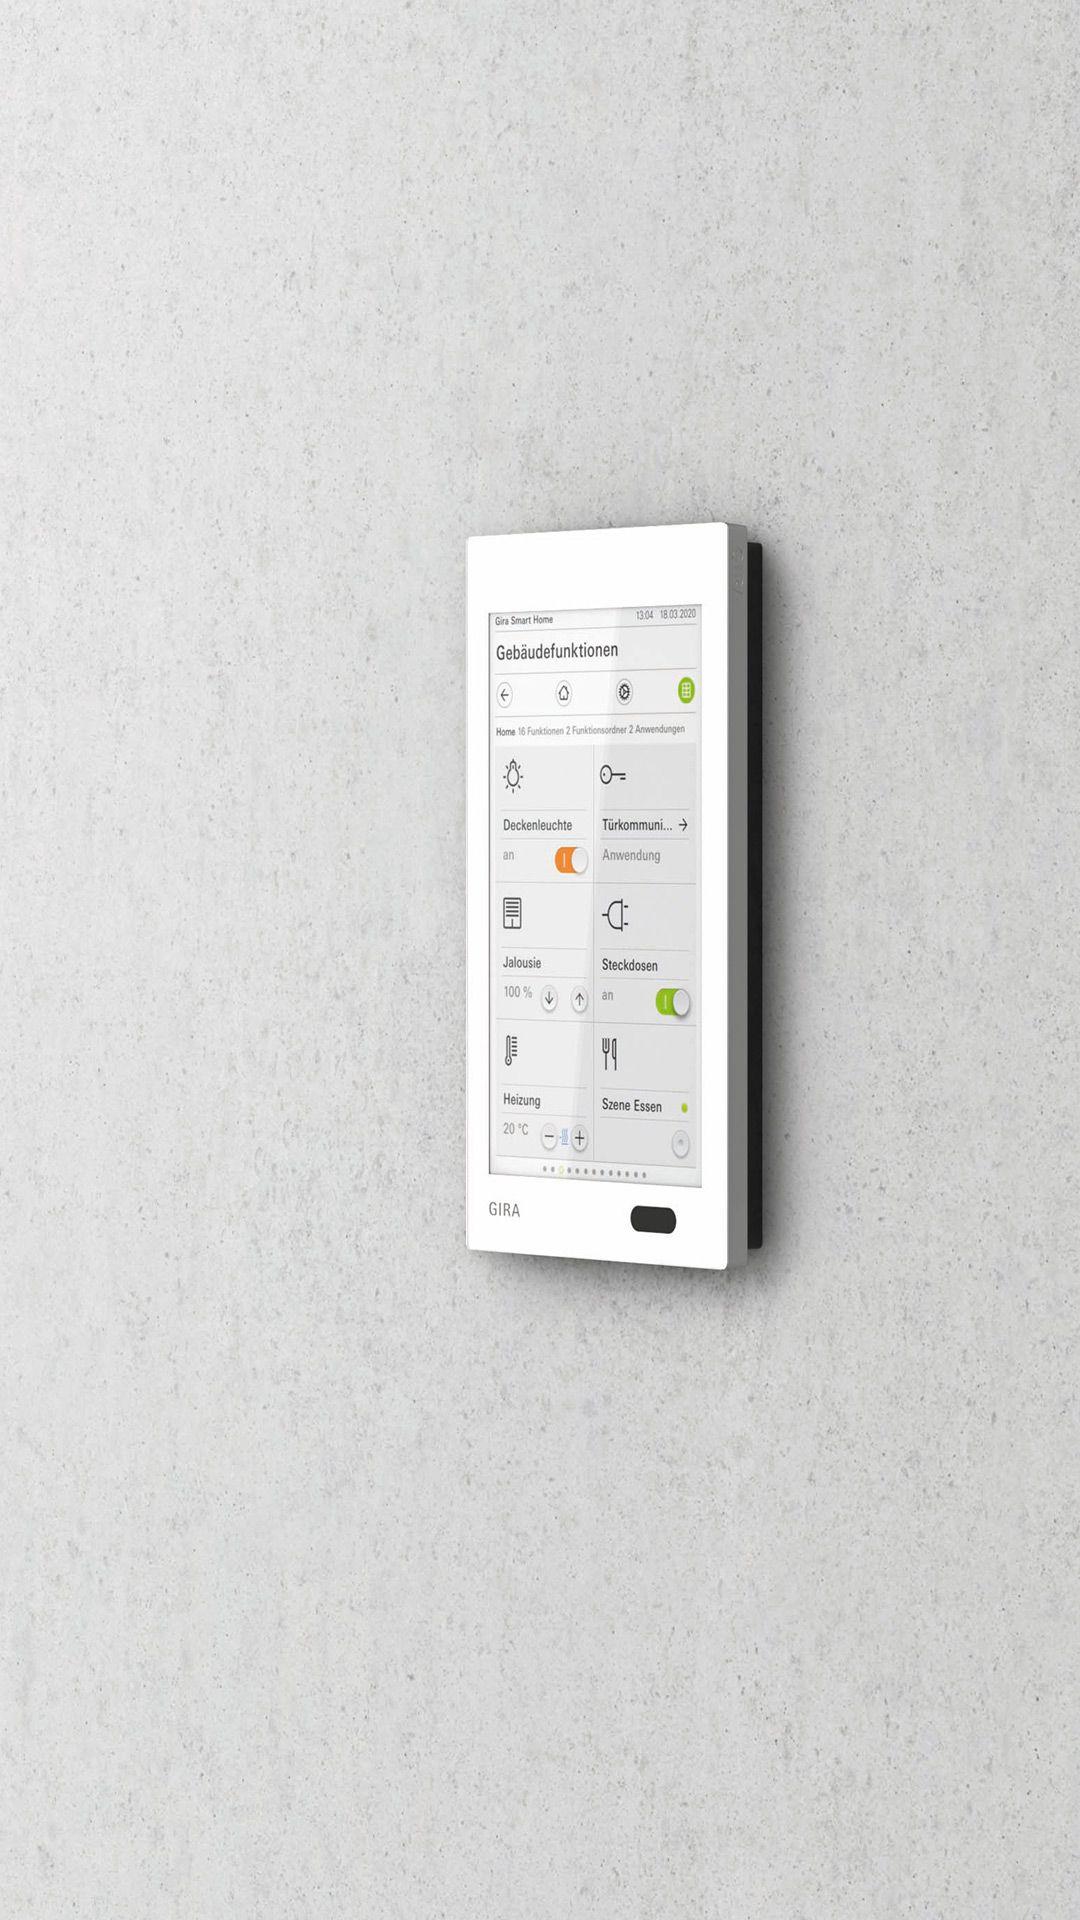 Intuitive Smart Home Steuerung Mit Dem Gira G1 In 2020 Intelligentes Haus Schalter Bewegungssensor